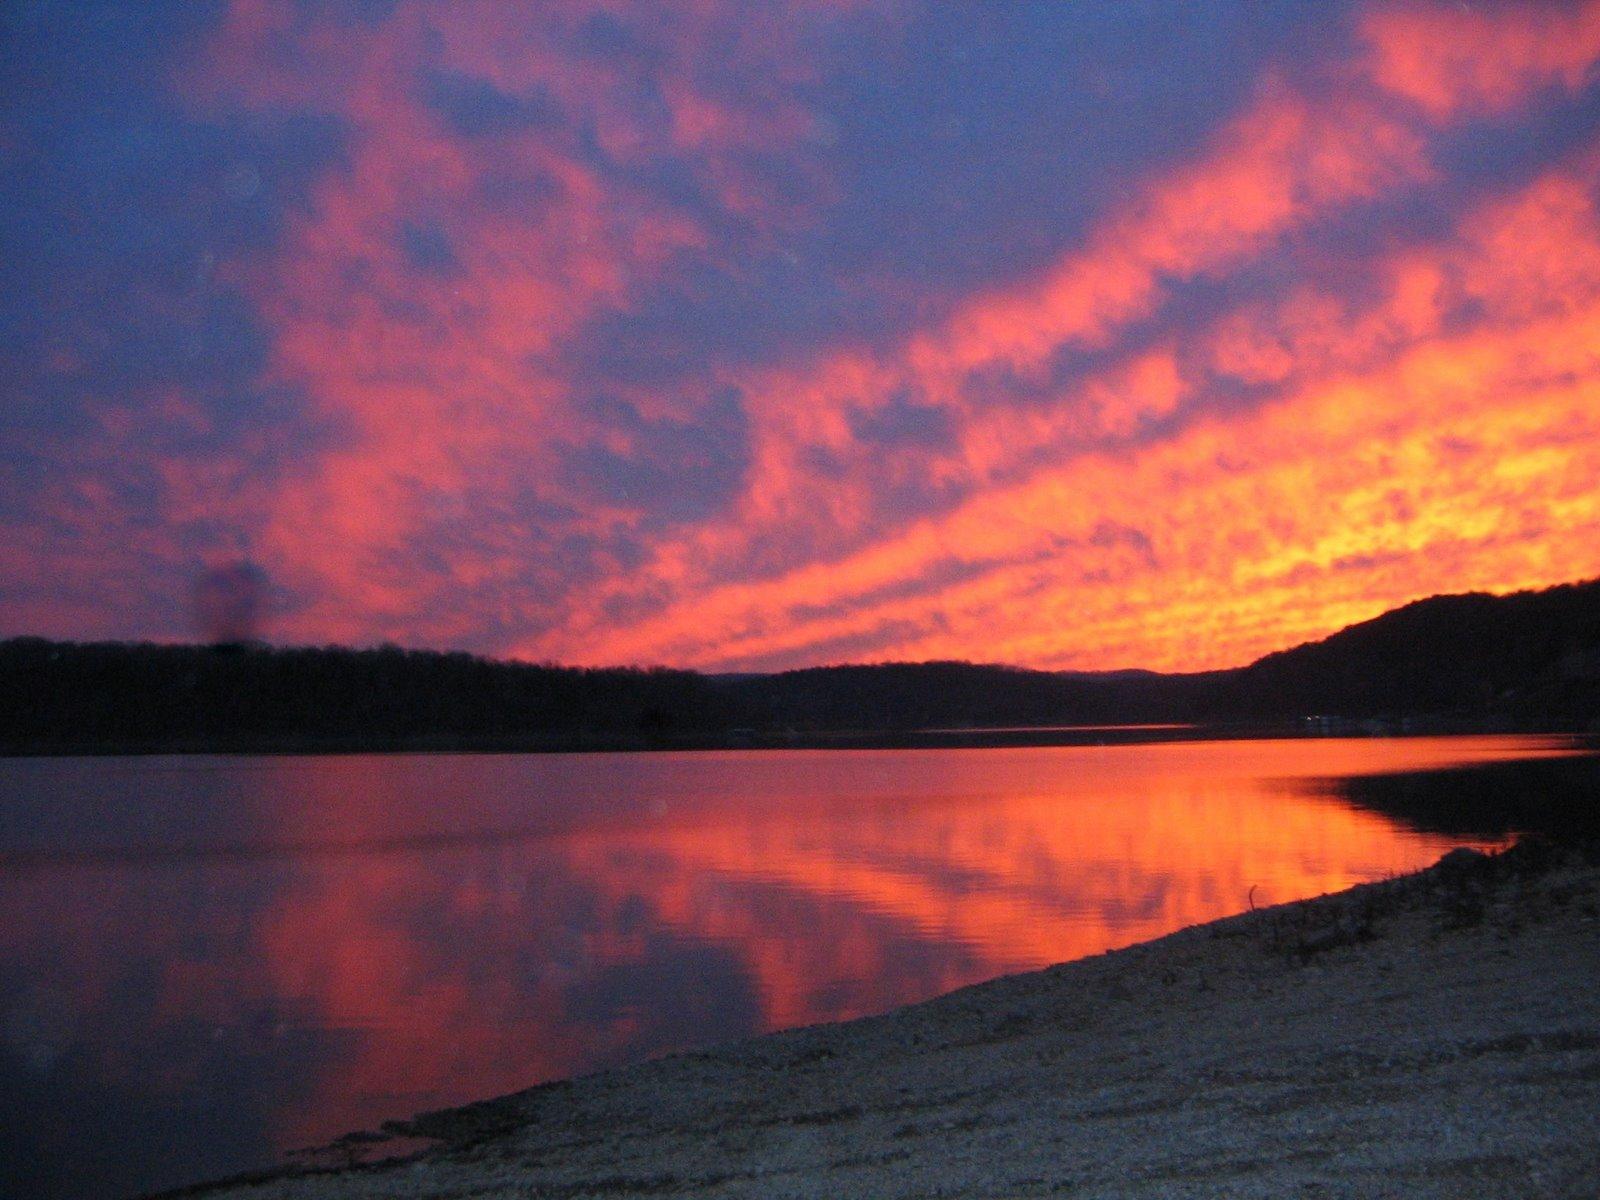 sunset-at-k-dock1